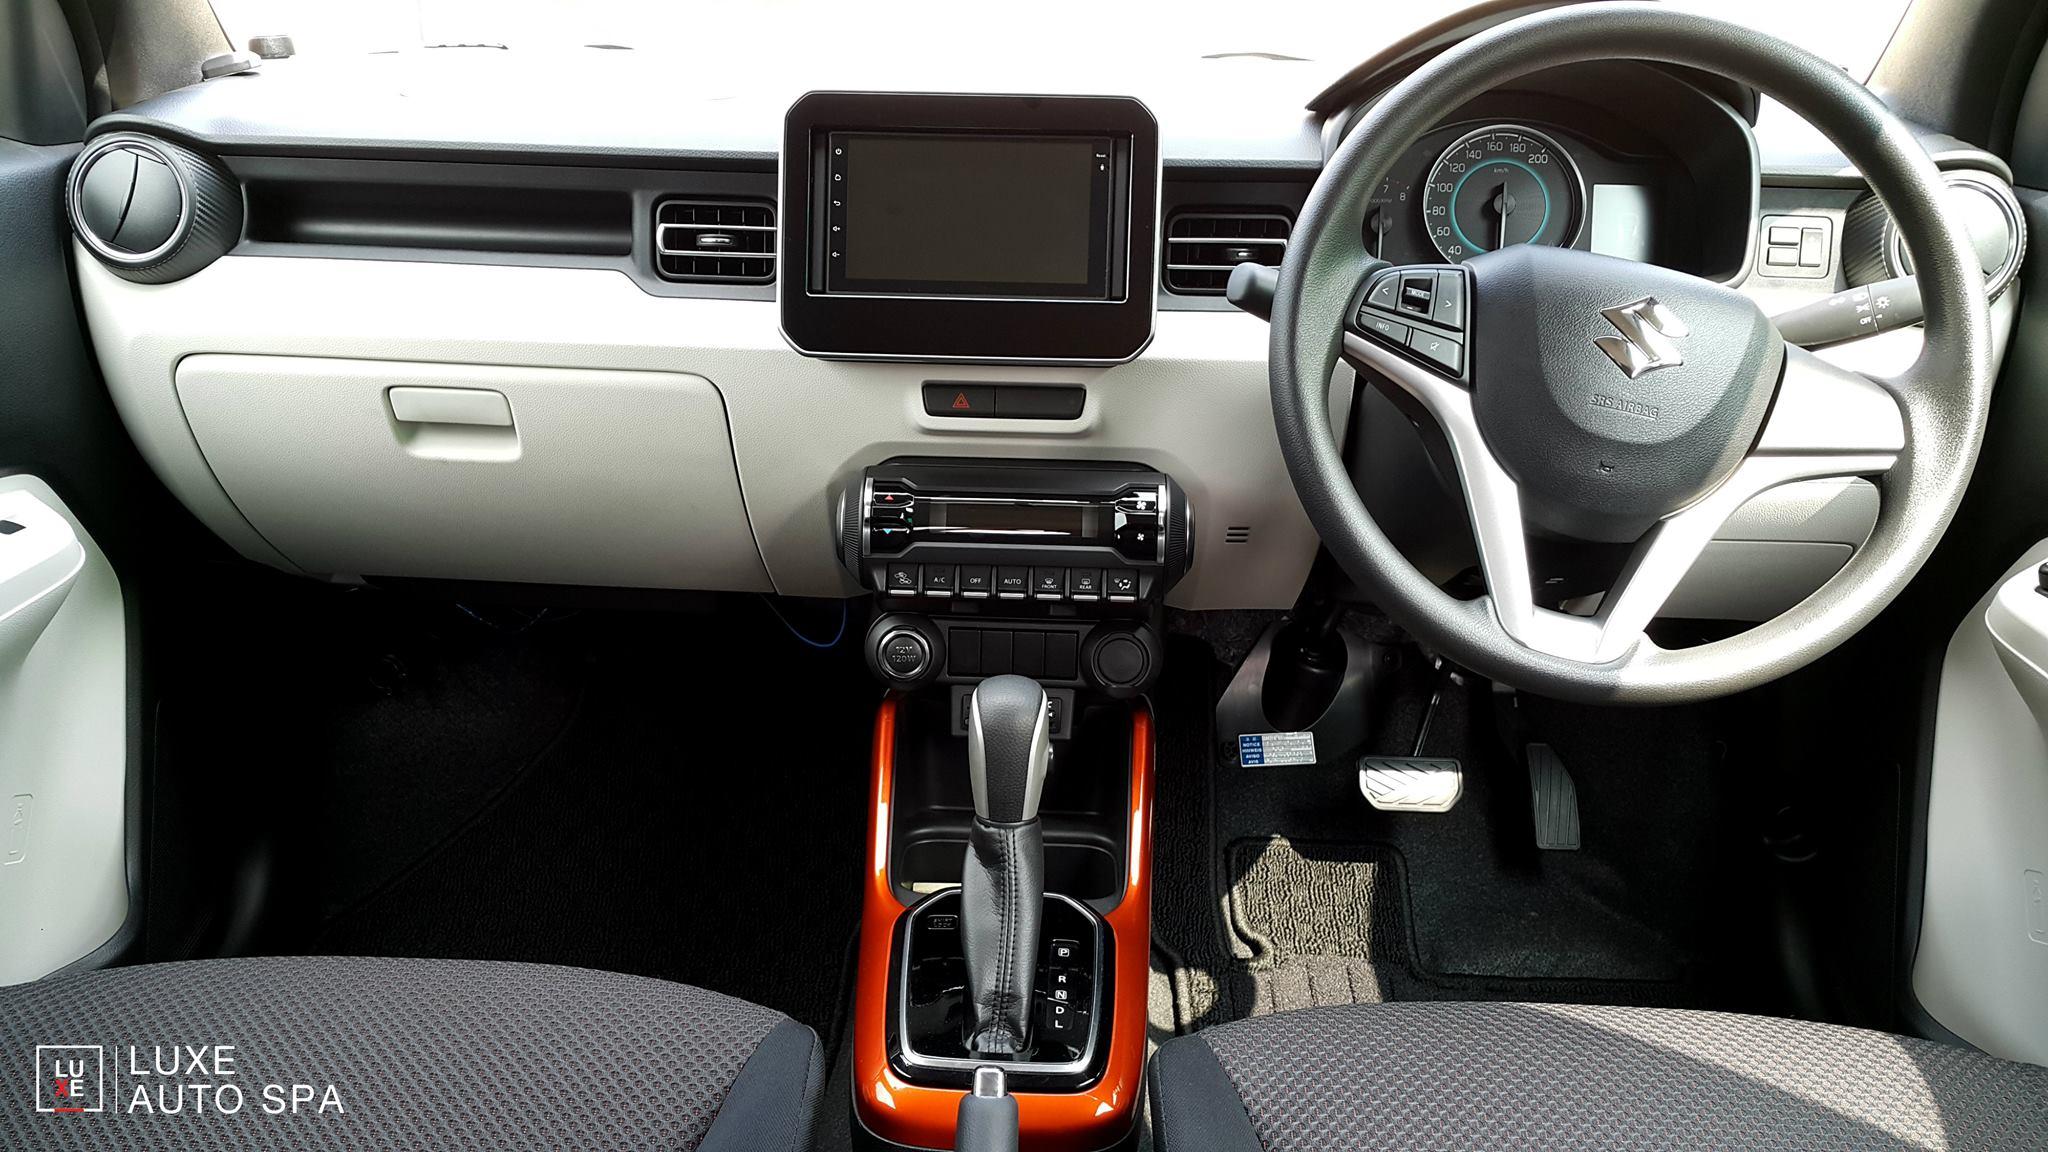 suzuki-ignis-pics-interior-dashboard